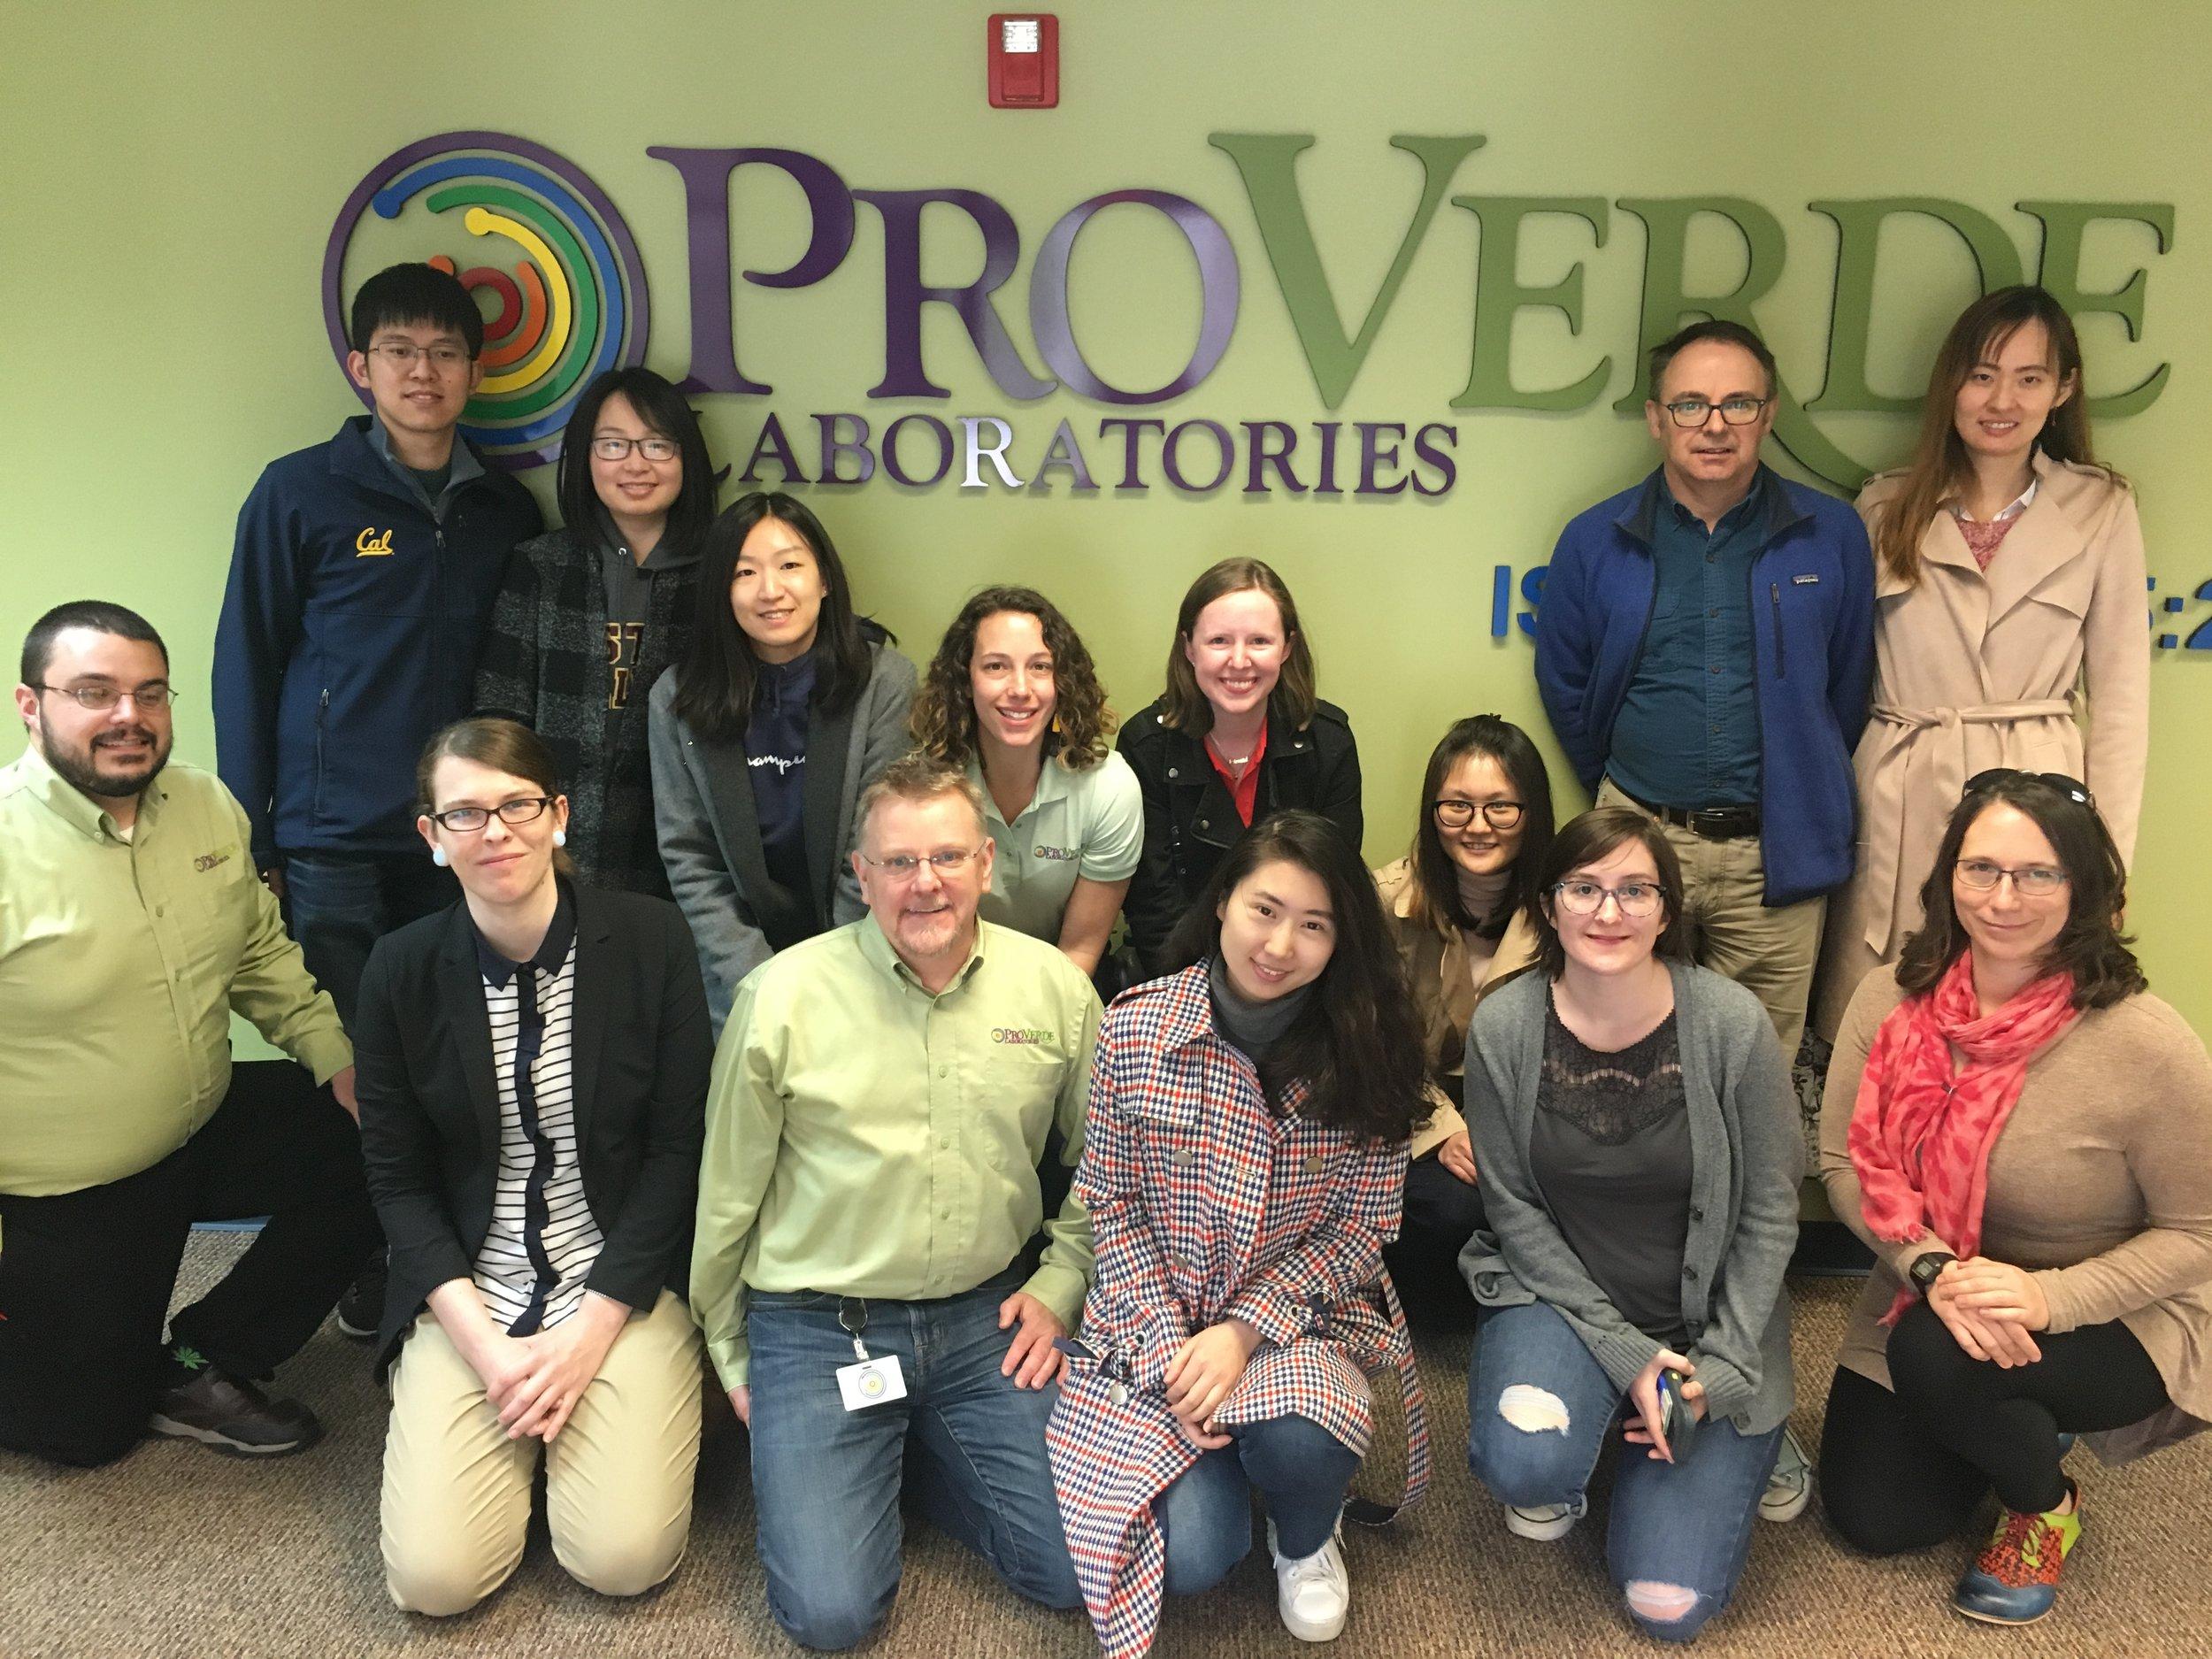 April 2019: ProVerde Laboratories, Milford, MA